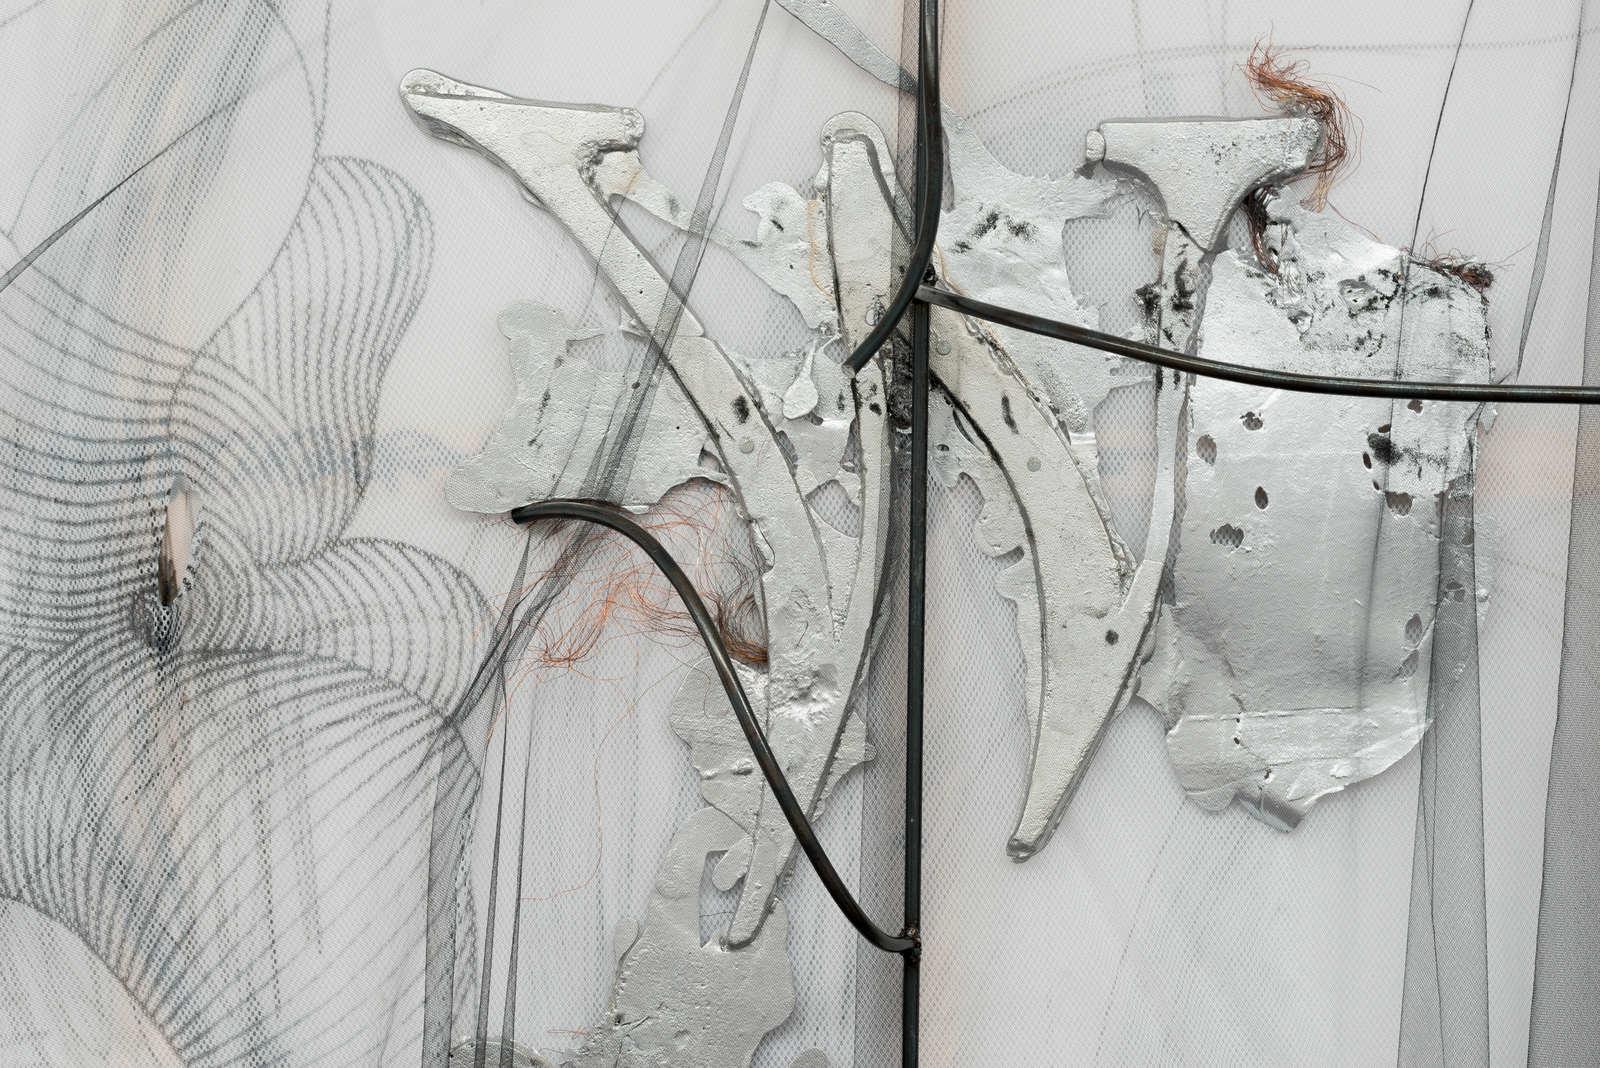 David Douard at Kunstverein Braunschweig_12